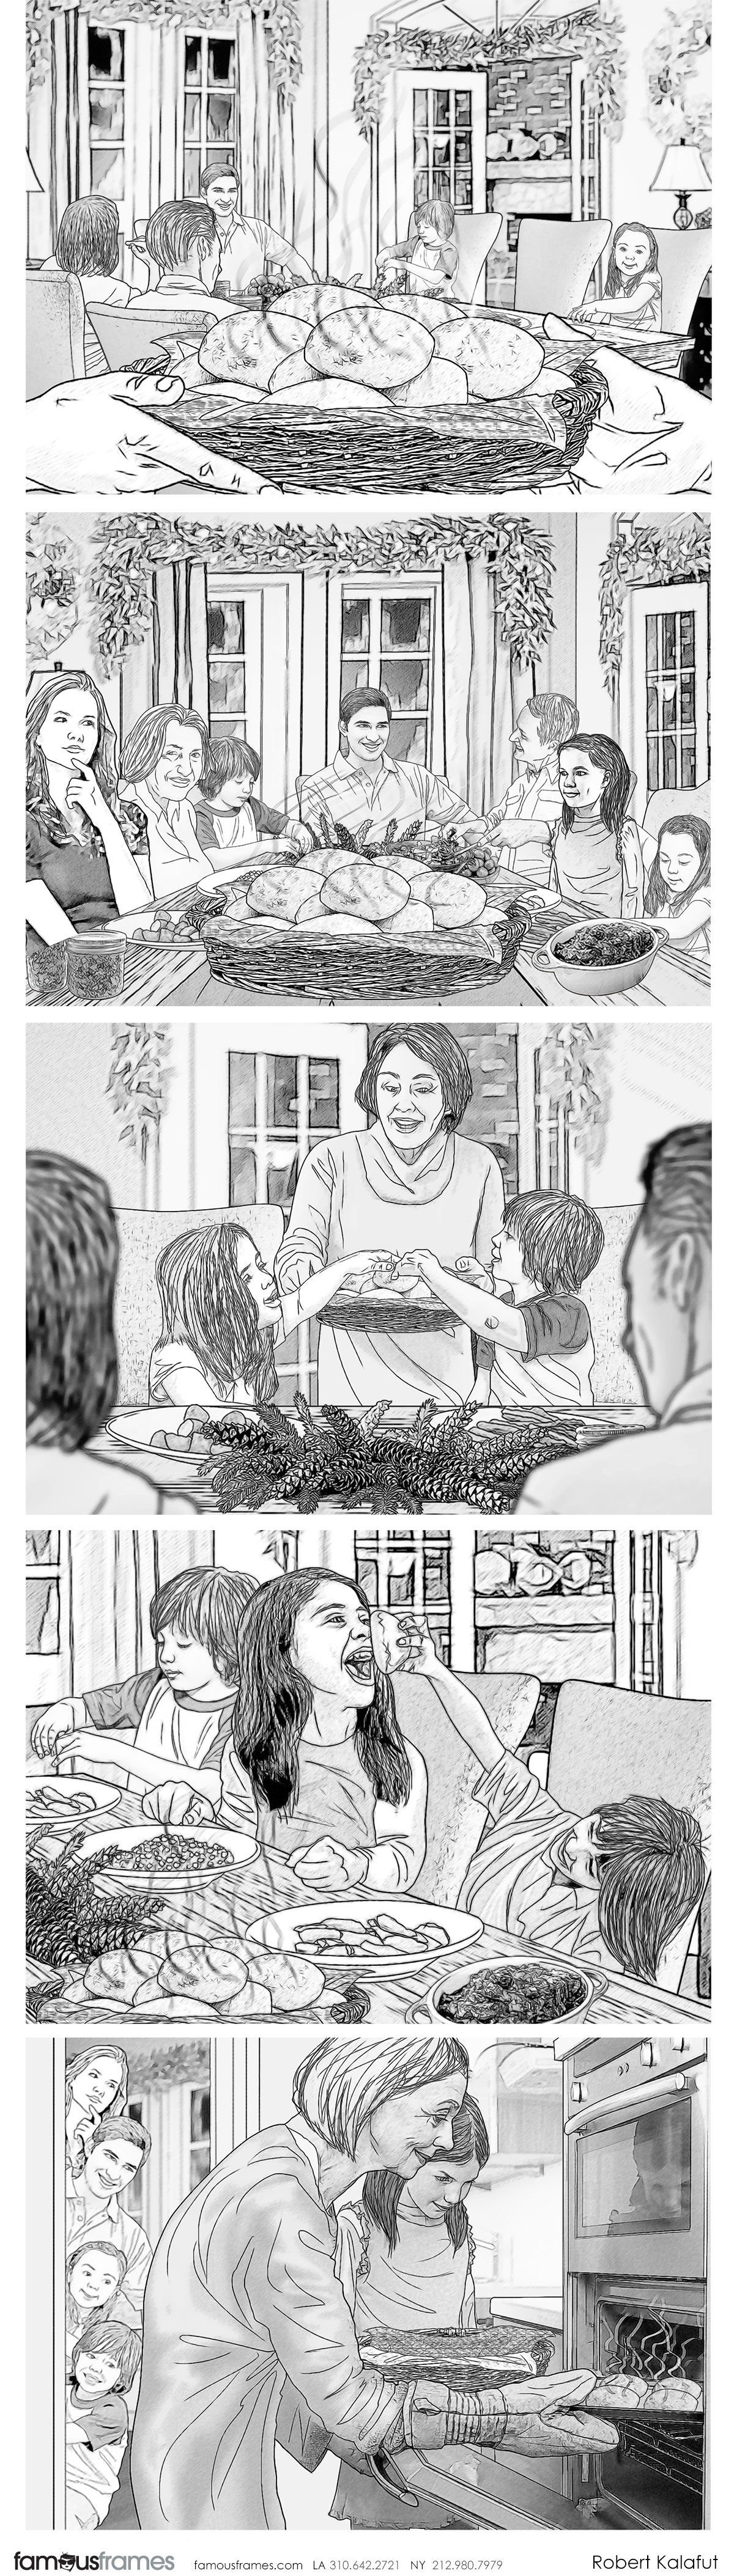 Robert Kalafut*'s People - B&W Line storyboard art (Image #116_114_1485462079)